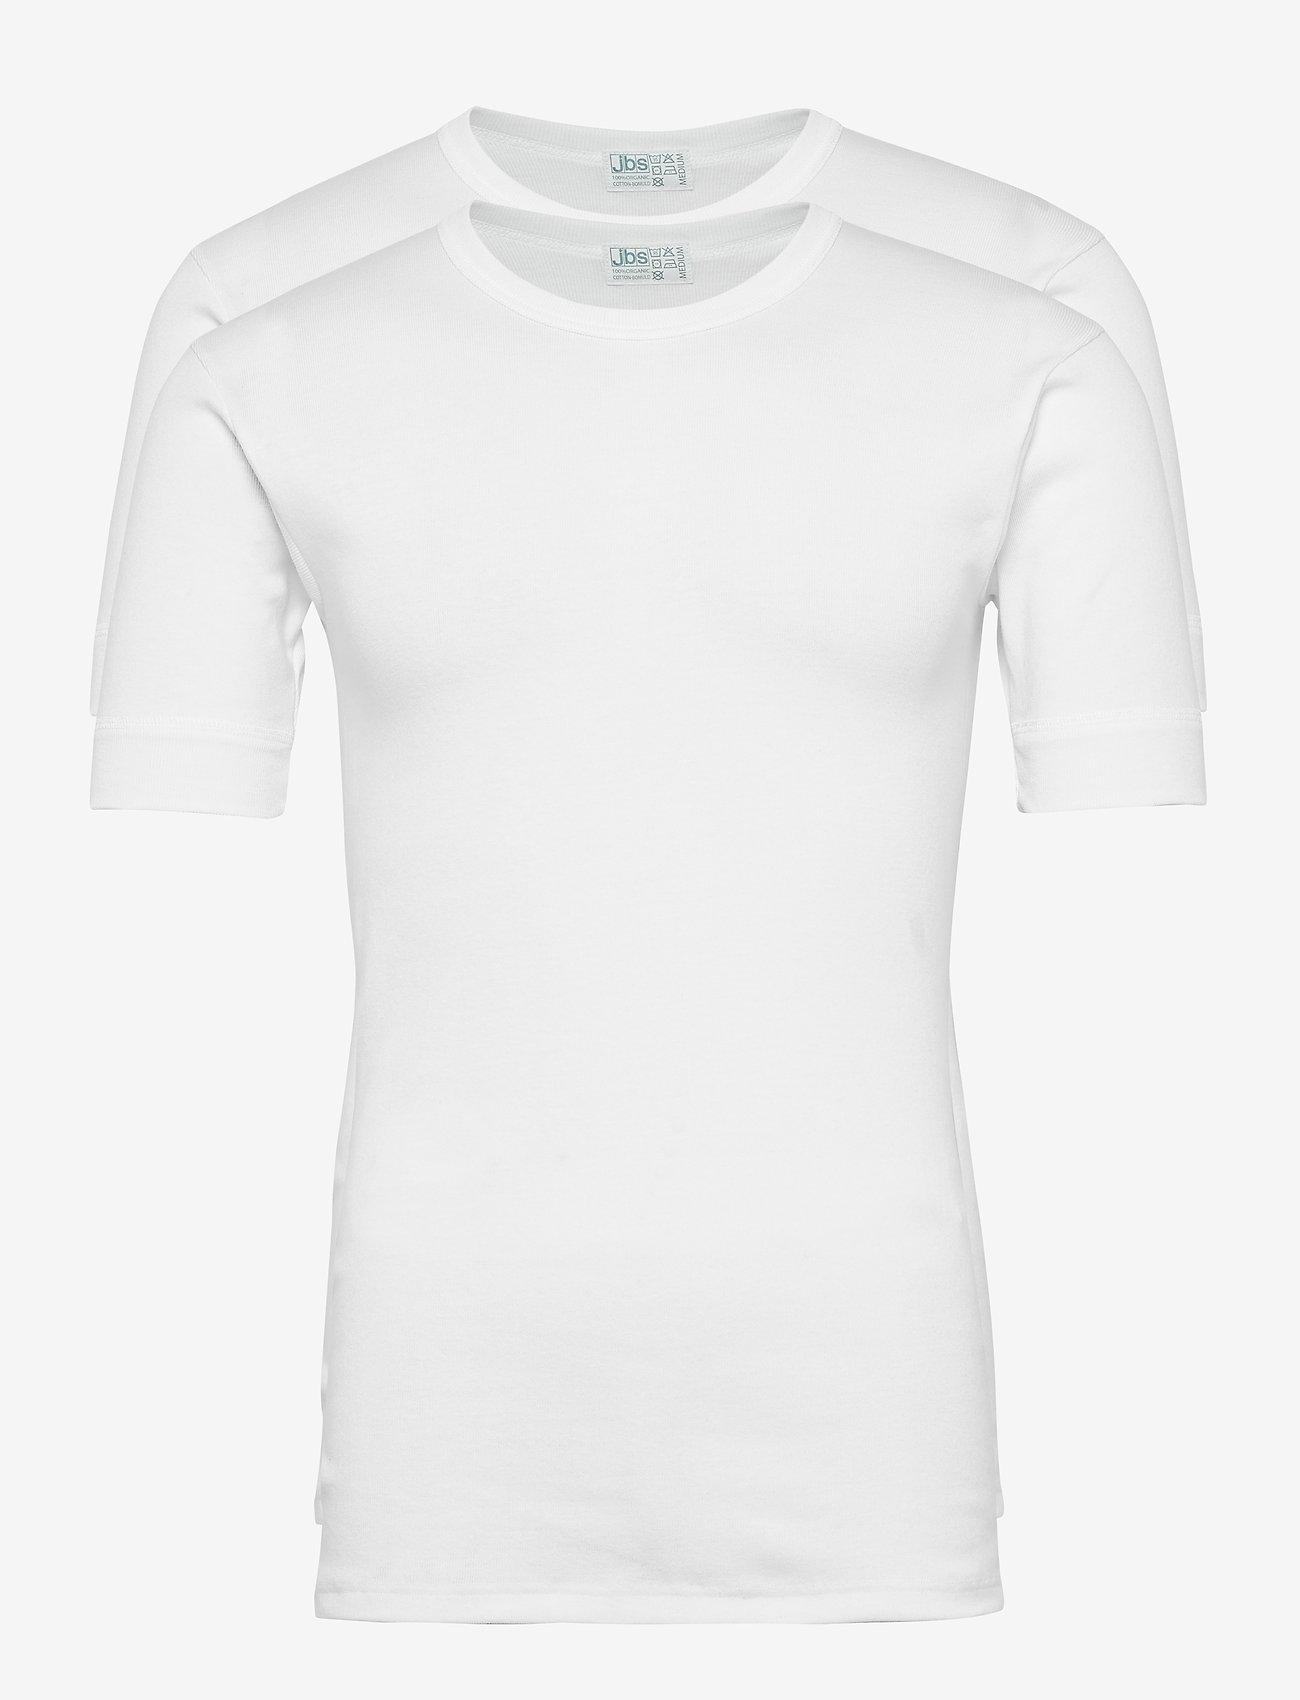 JBS - JBS t-shirt 2-pack organic - multipack - white - 0